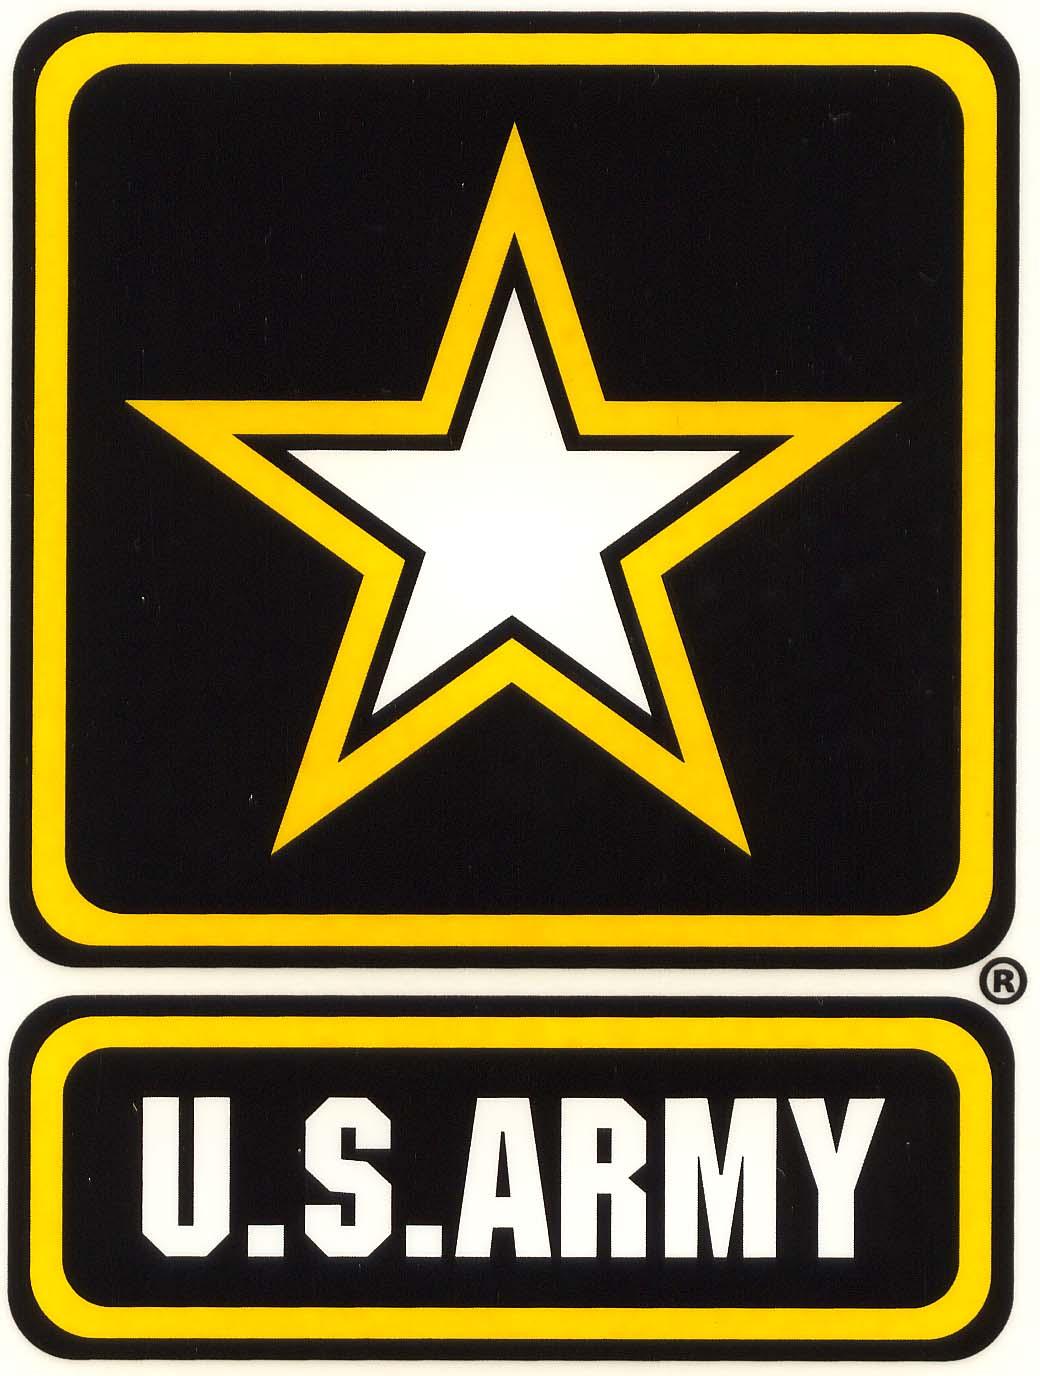 U.S. Army group - Mod DB